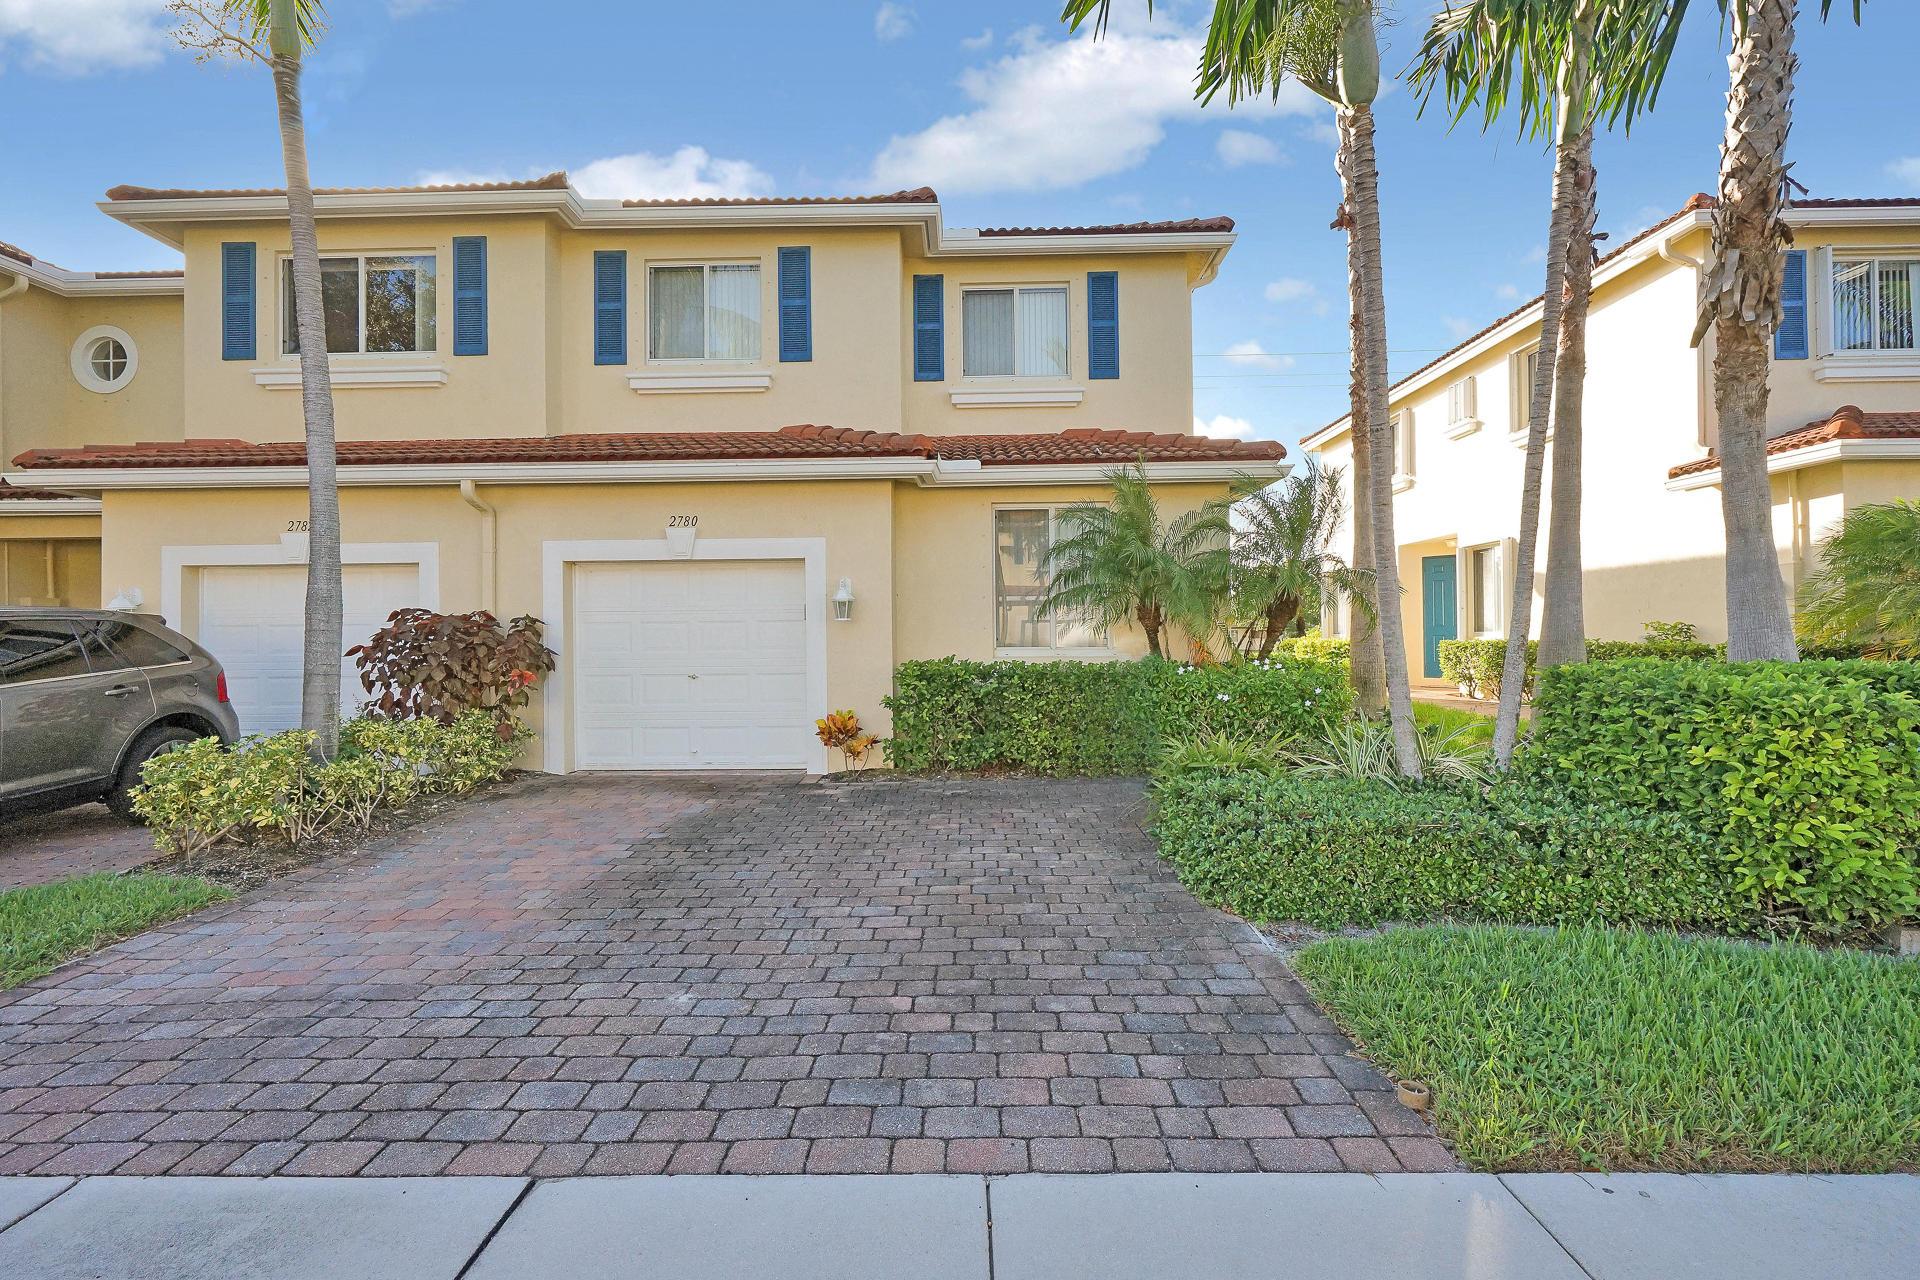 2780 S Evergreen Circle Boynton Beach, FL 33426